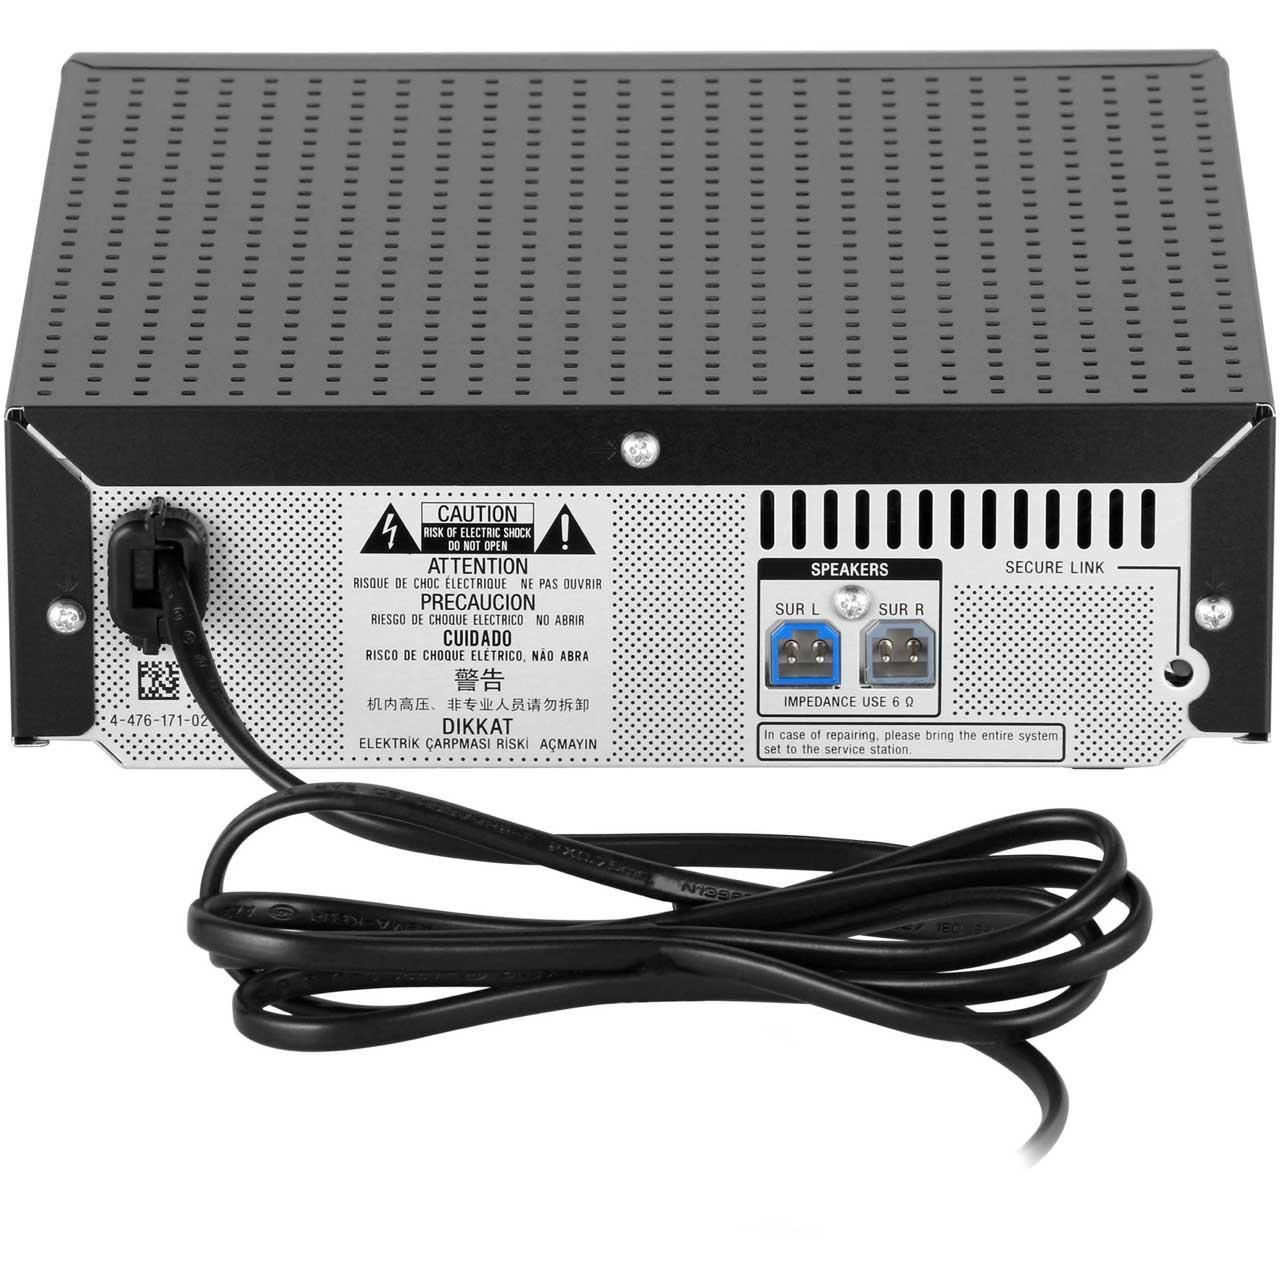 sony radio wiring good or bad mini auto fuse box military